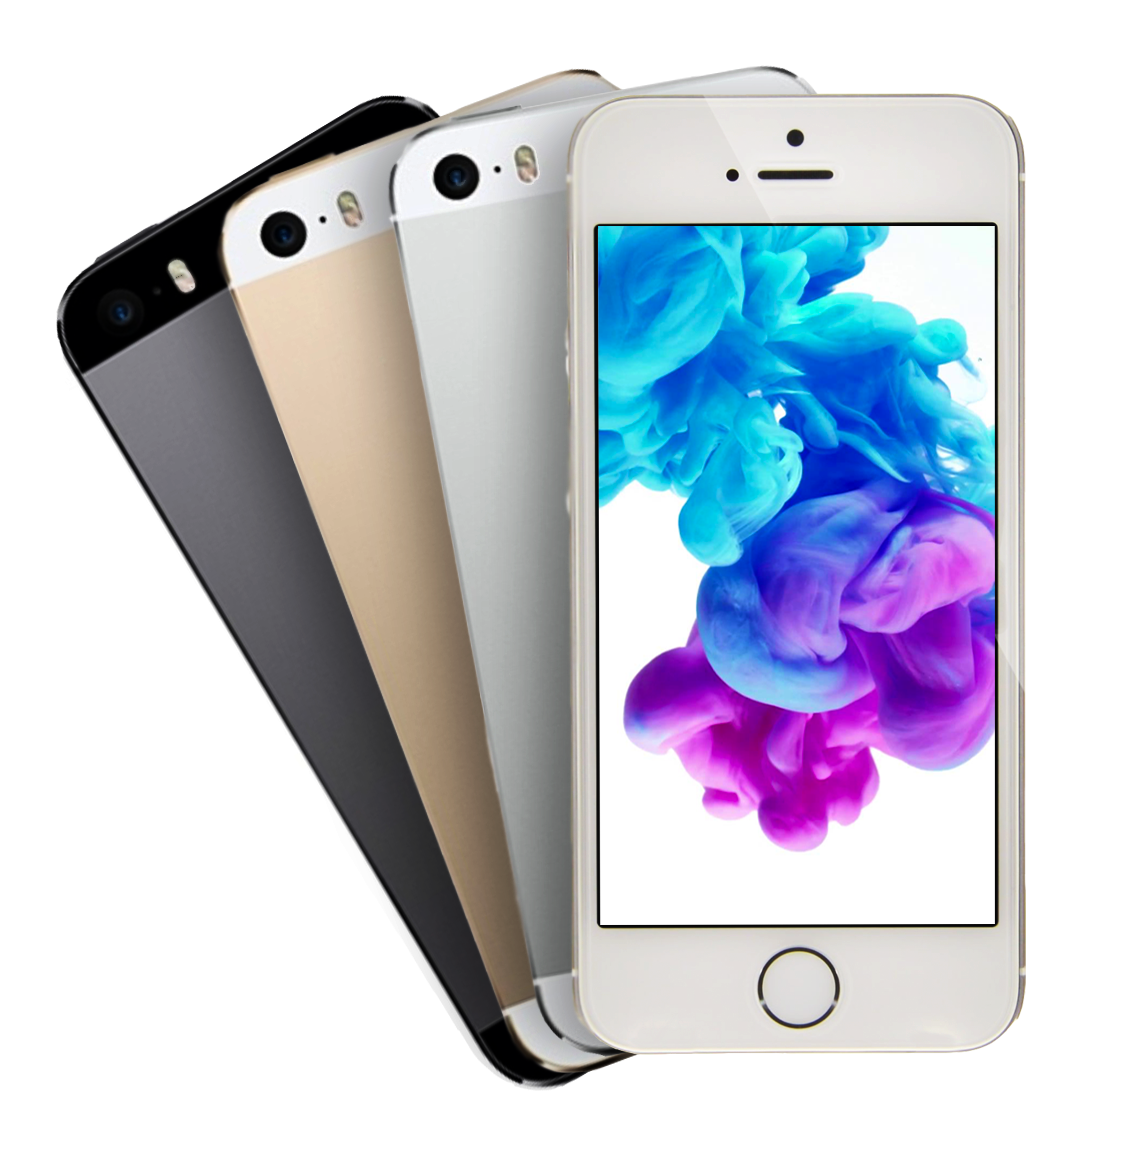 iphone 5s 32 gb gold gebraucht refurbished. Black Bedroom Furniture Sets. Home Design Ideas